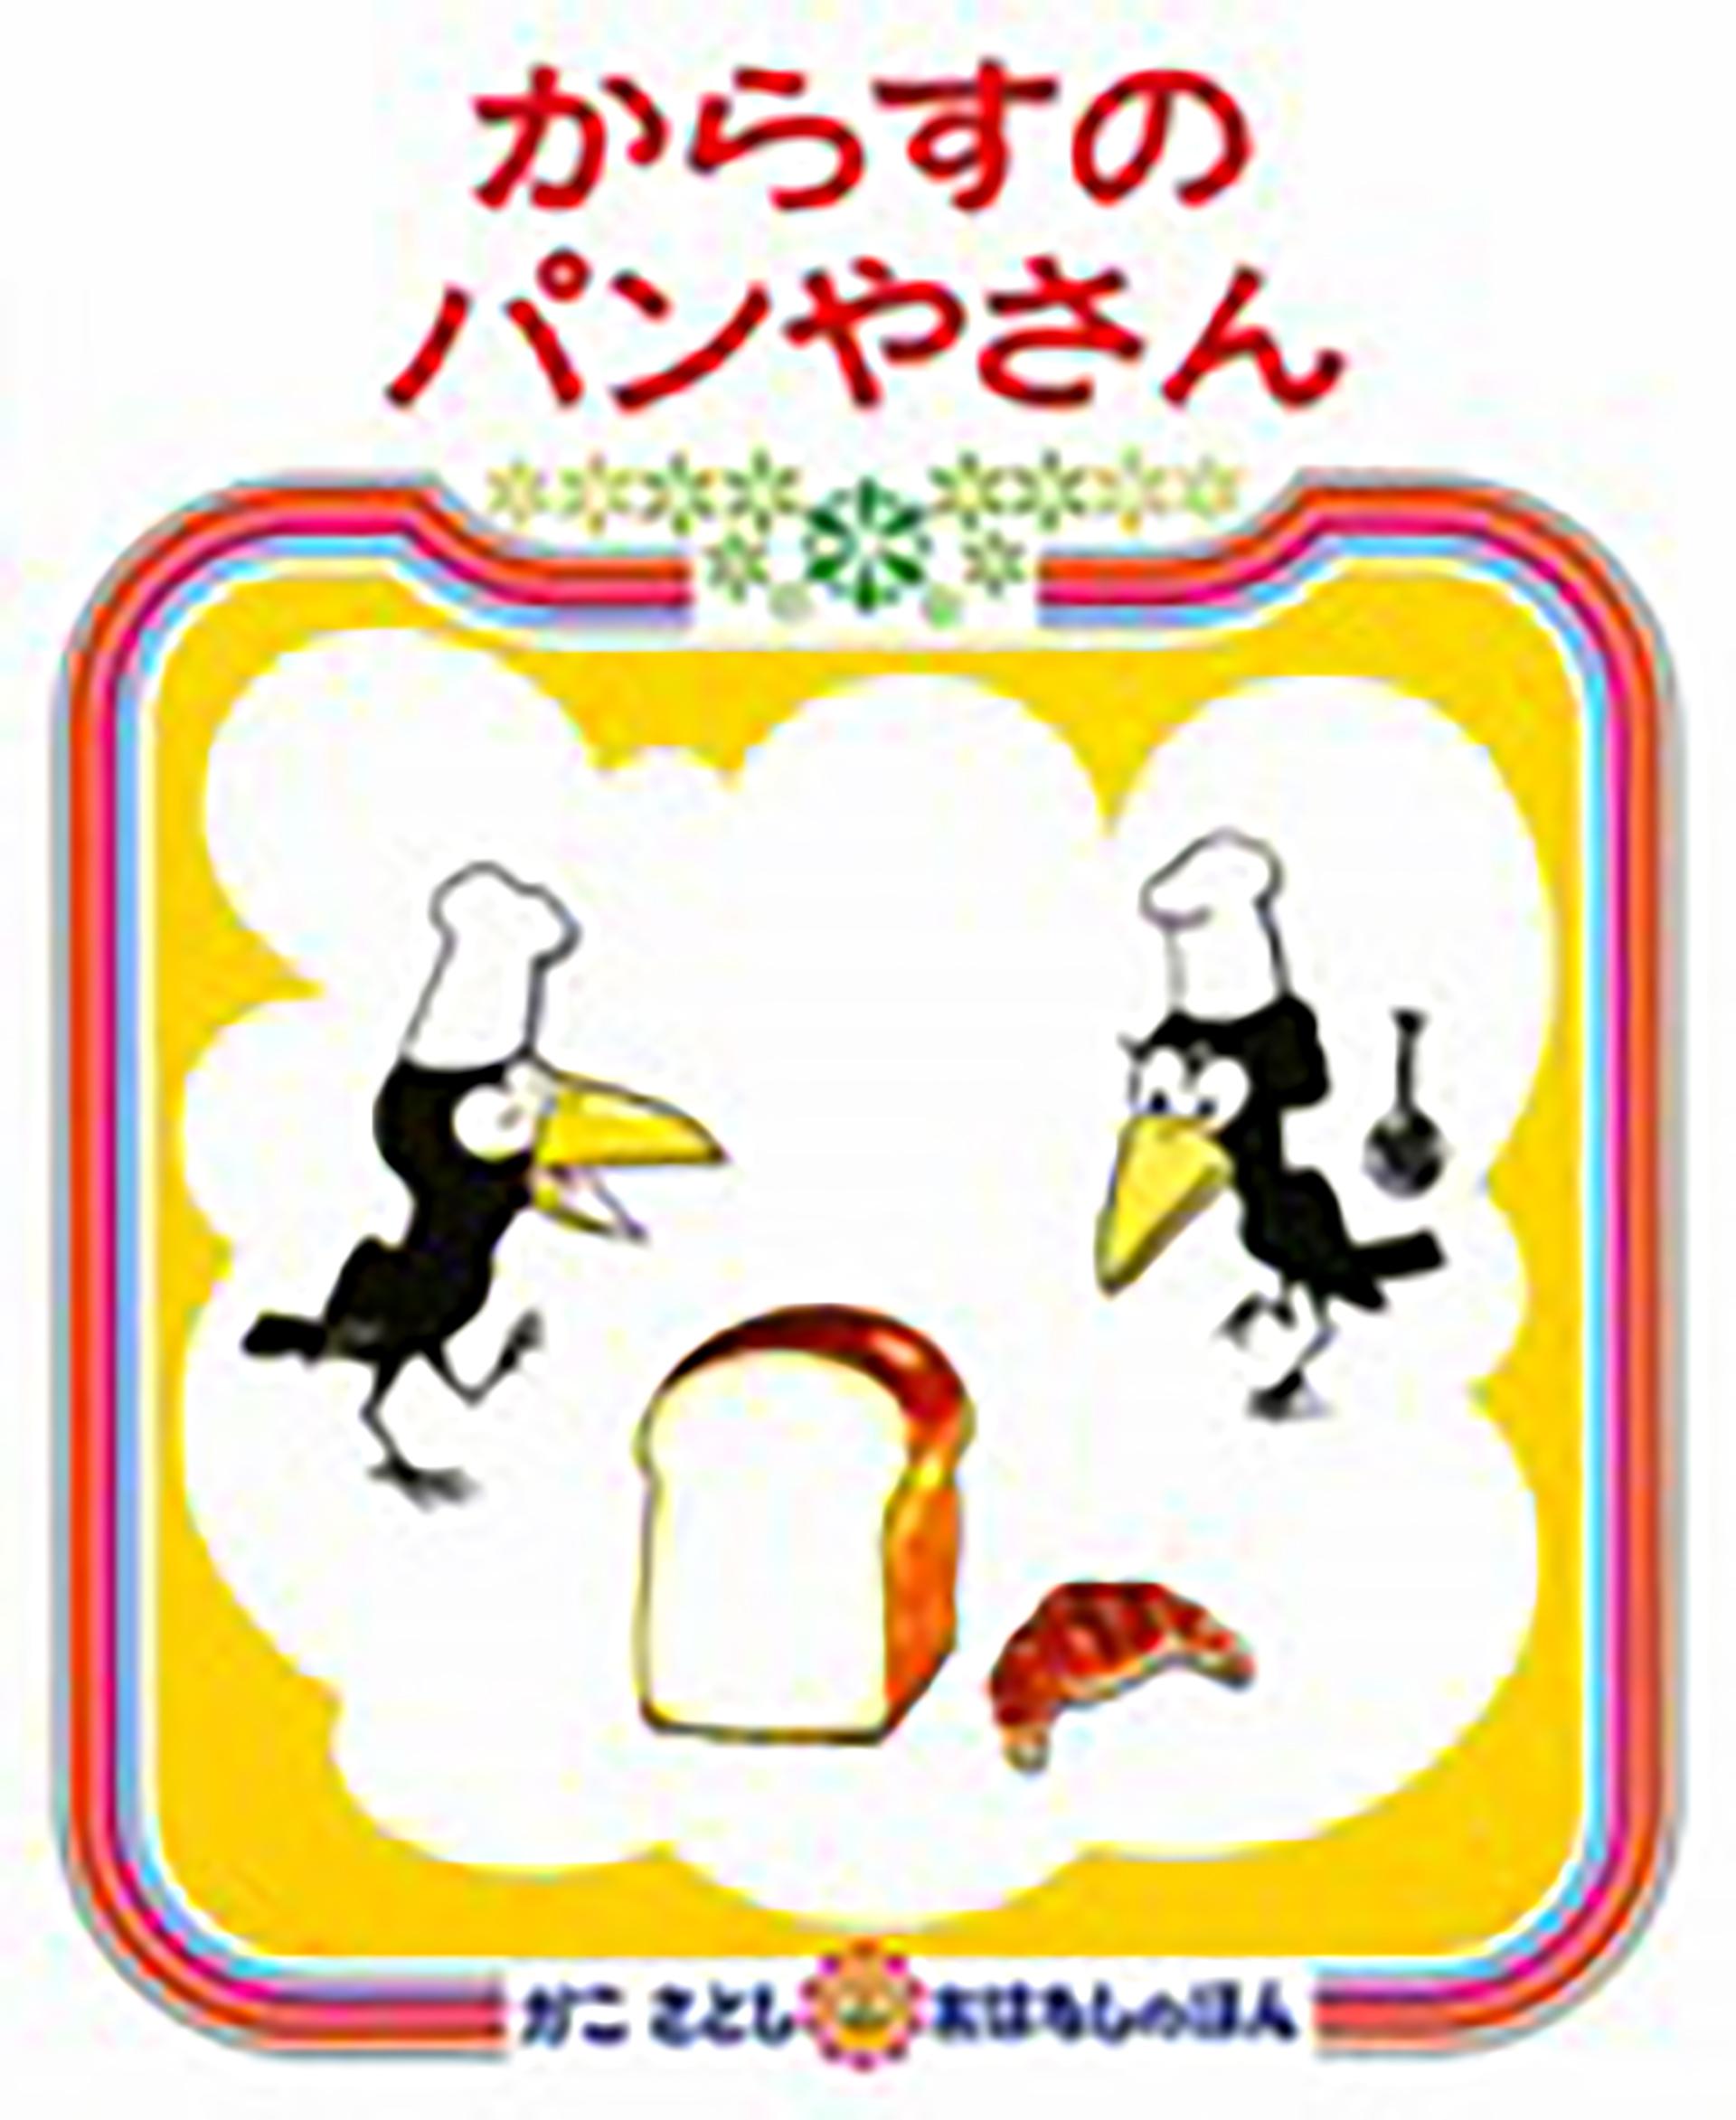 NTT西日本スペシャル  絵本ミュージアム